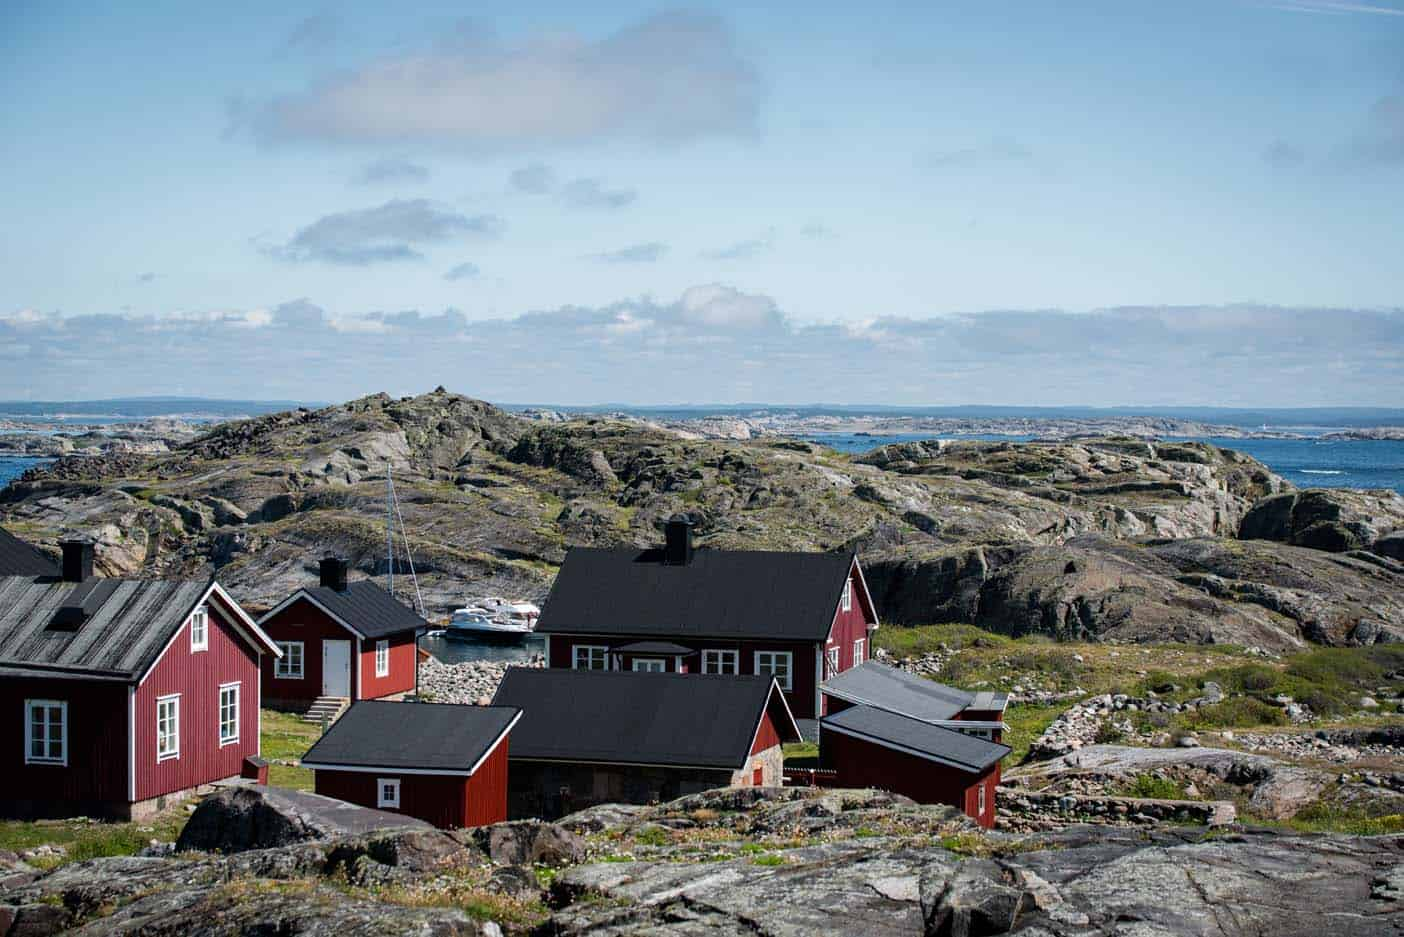 Zweden kosterhavet